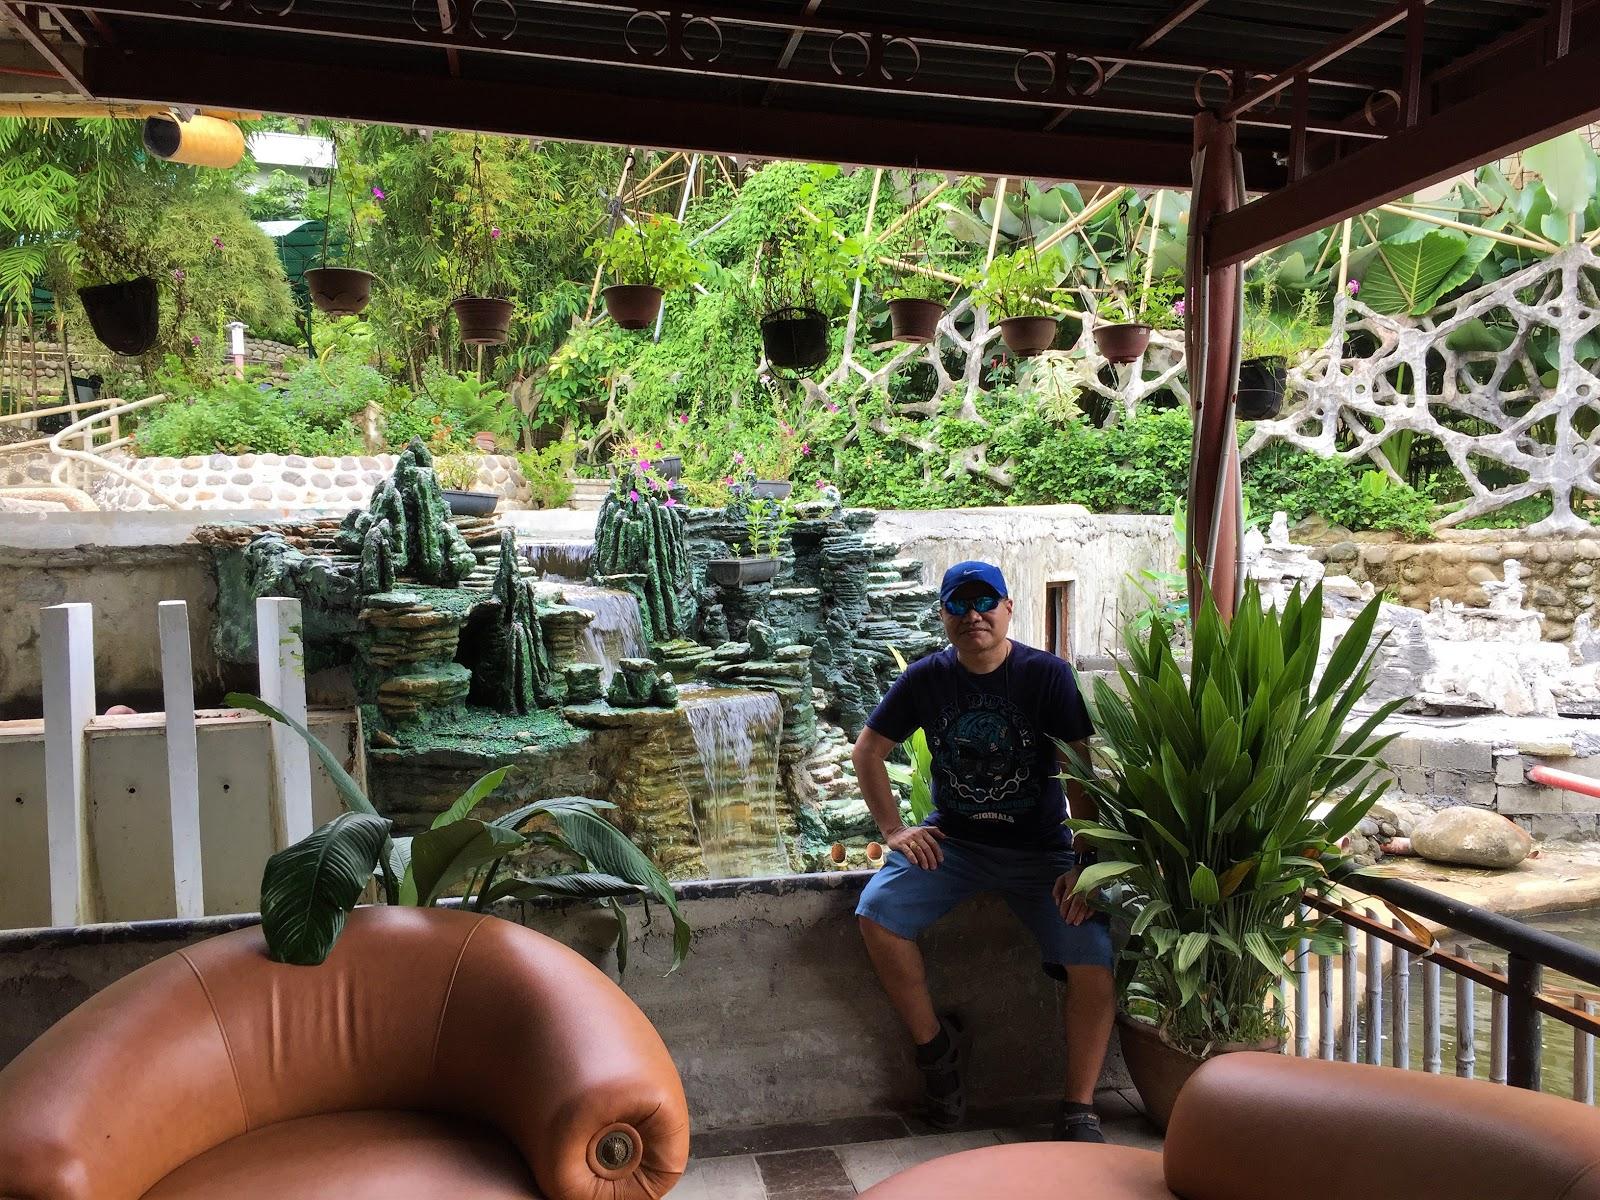 Scorpio's Sojourns: Dashing into Davao's Bamboo Sanctuary